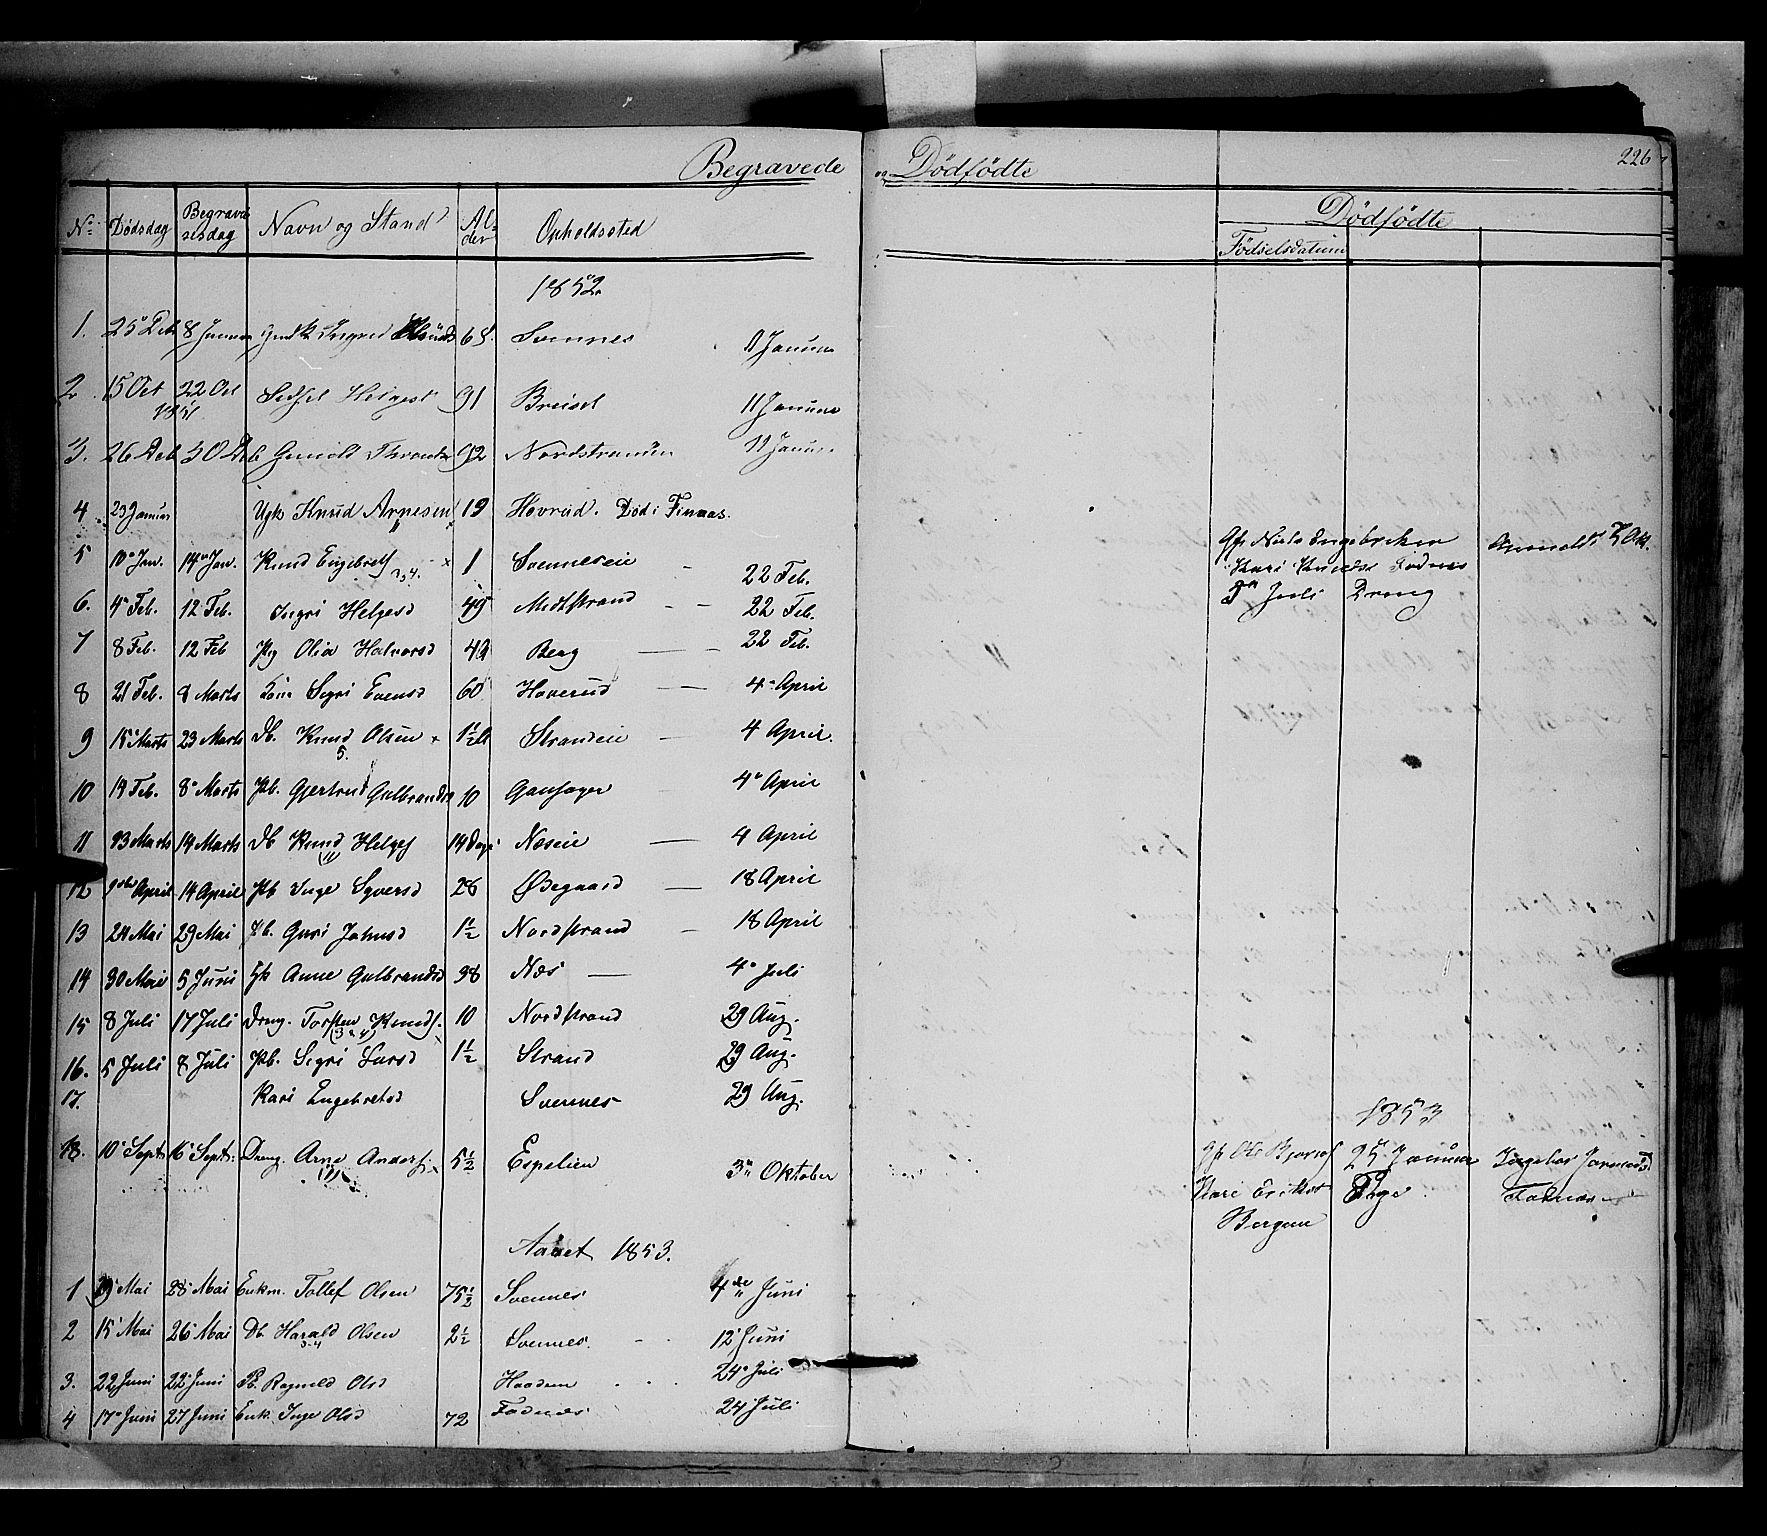 SAH, Nord-Aurdal prestekontor, Ministerialbok nr. 5, 1842-1863, s. 226